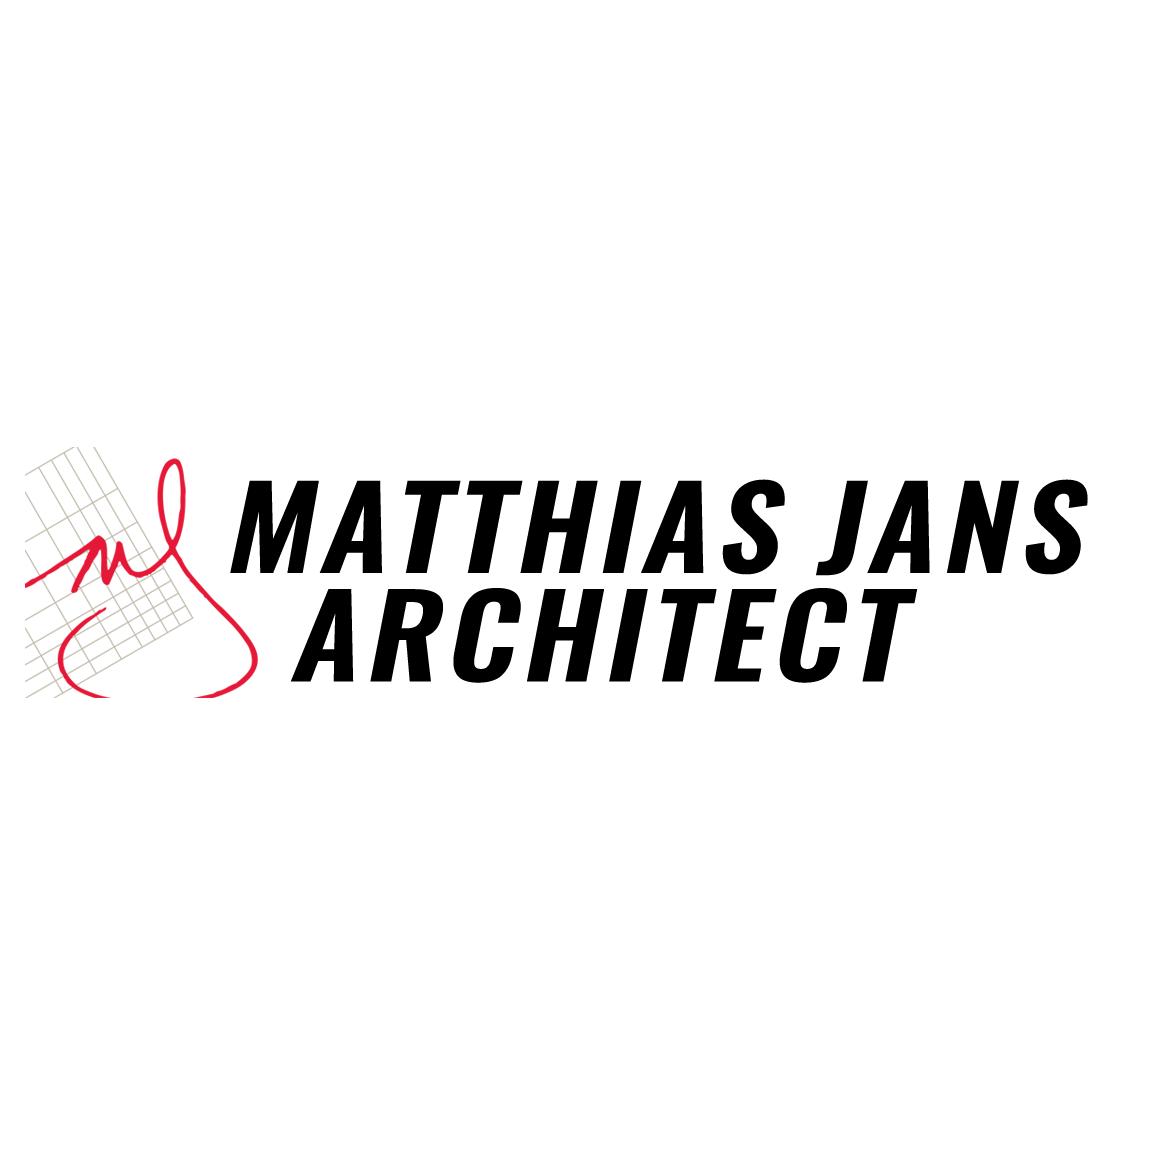 Matthias Jans Architect